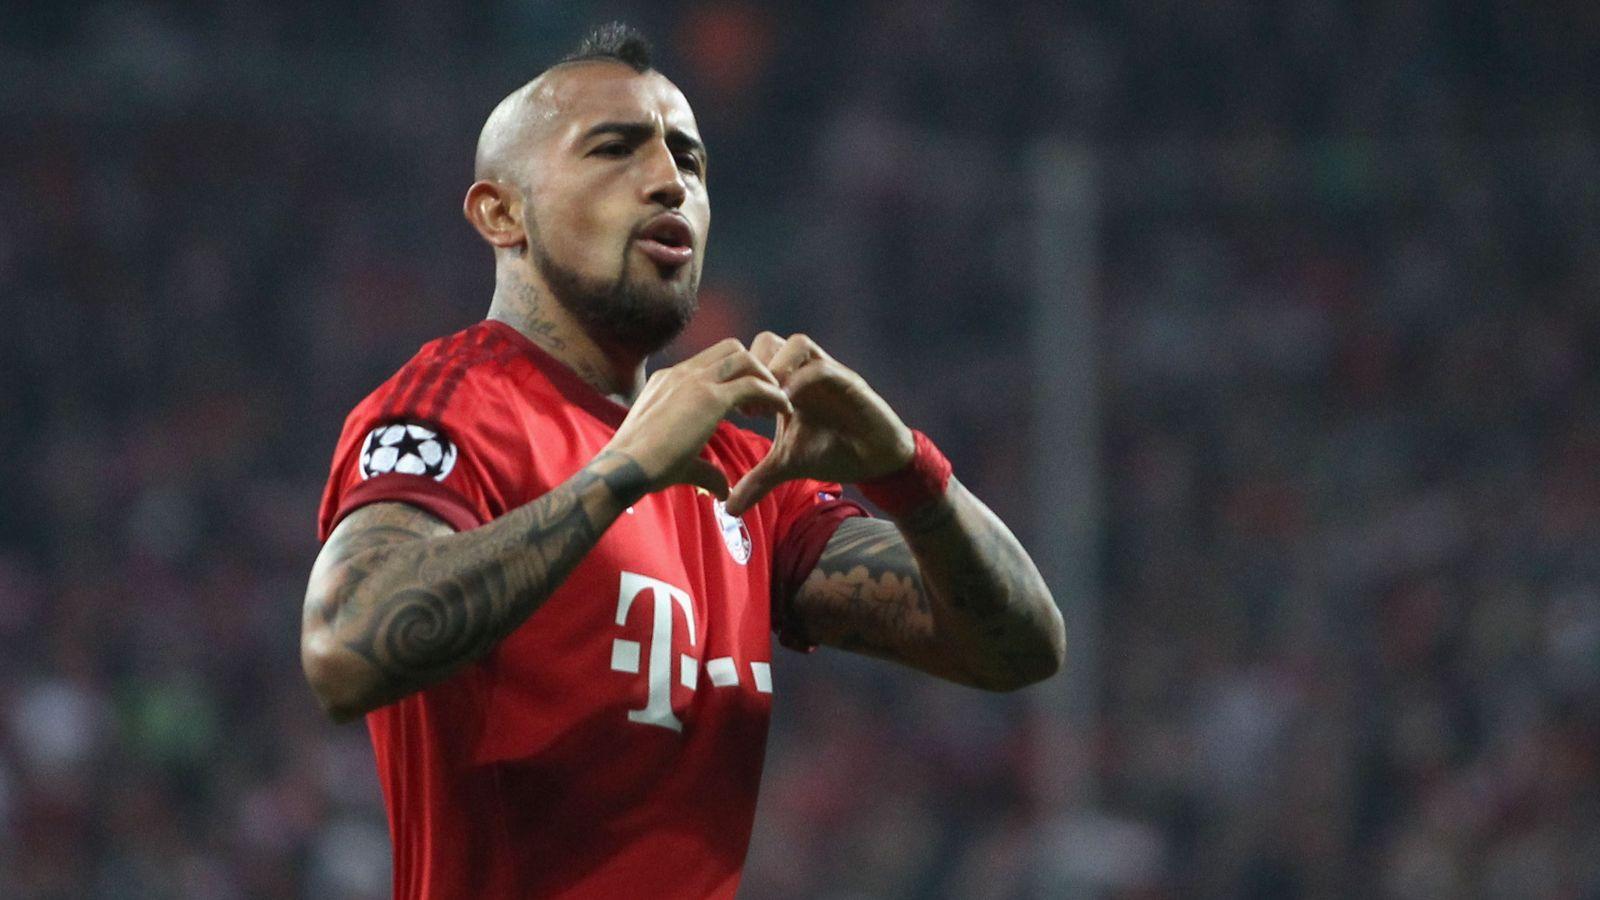 Guardiola praises Bayern's match-winner Vidal after Benfica win